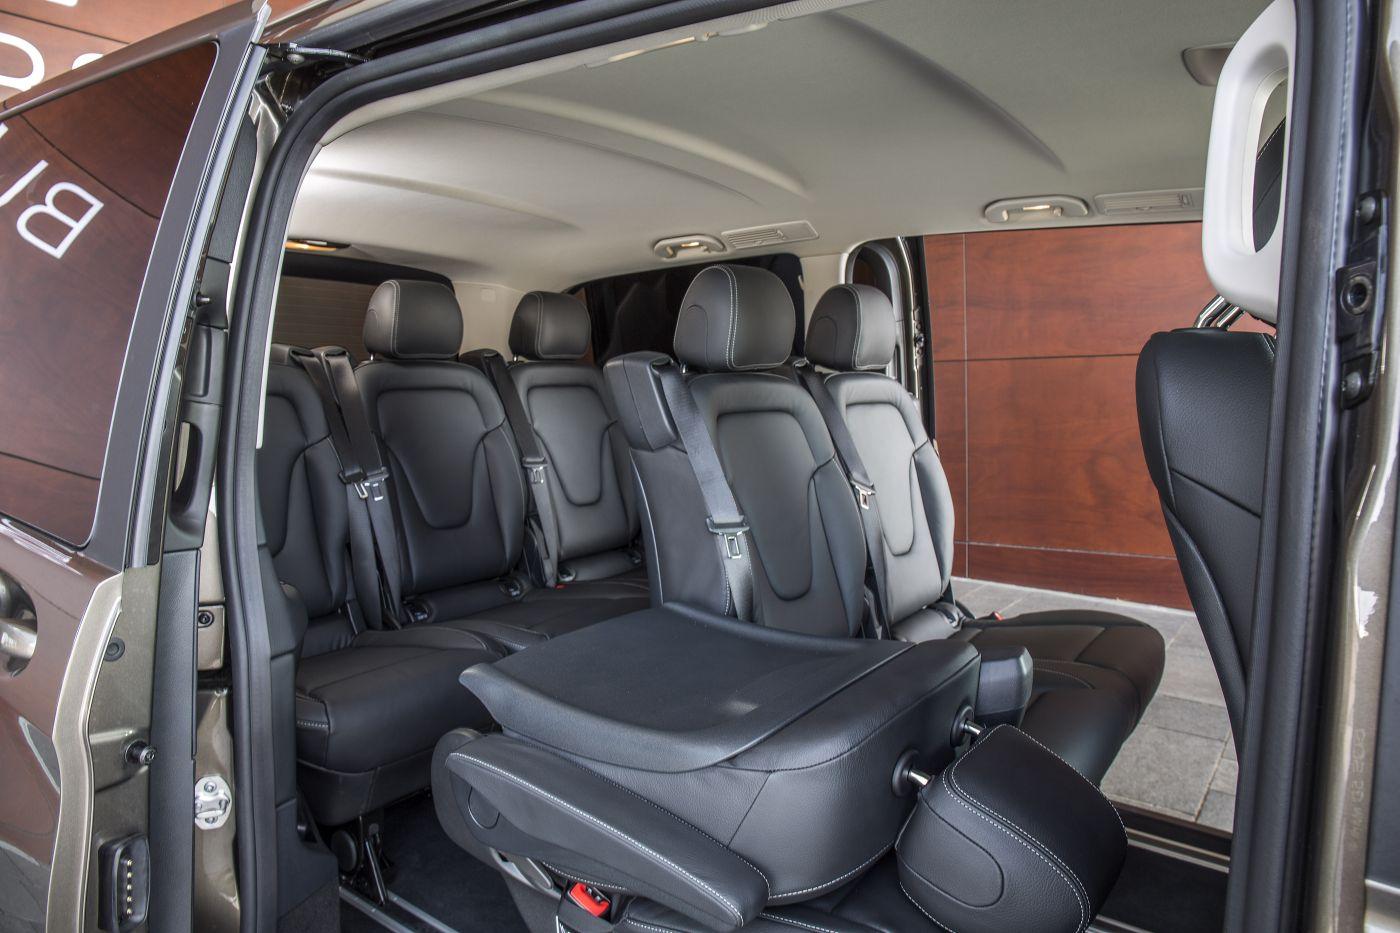 neue mercedes v klasse testbericht gro raumlimousine. Black Bedroom Furniture Sets. Home Design Ideas